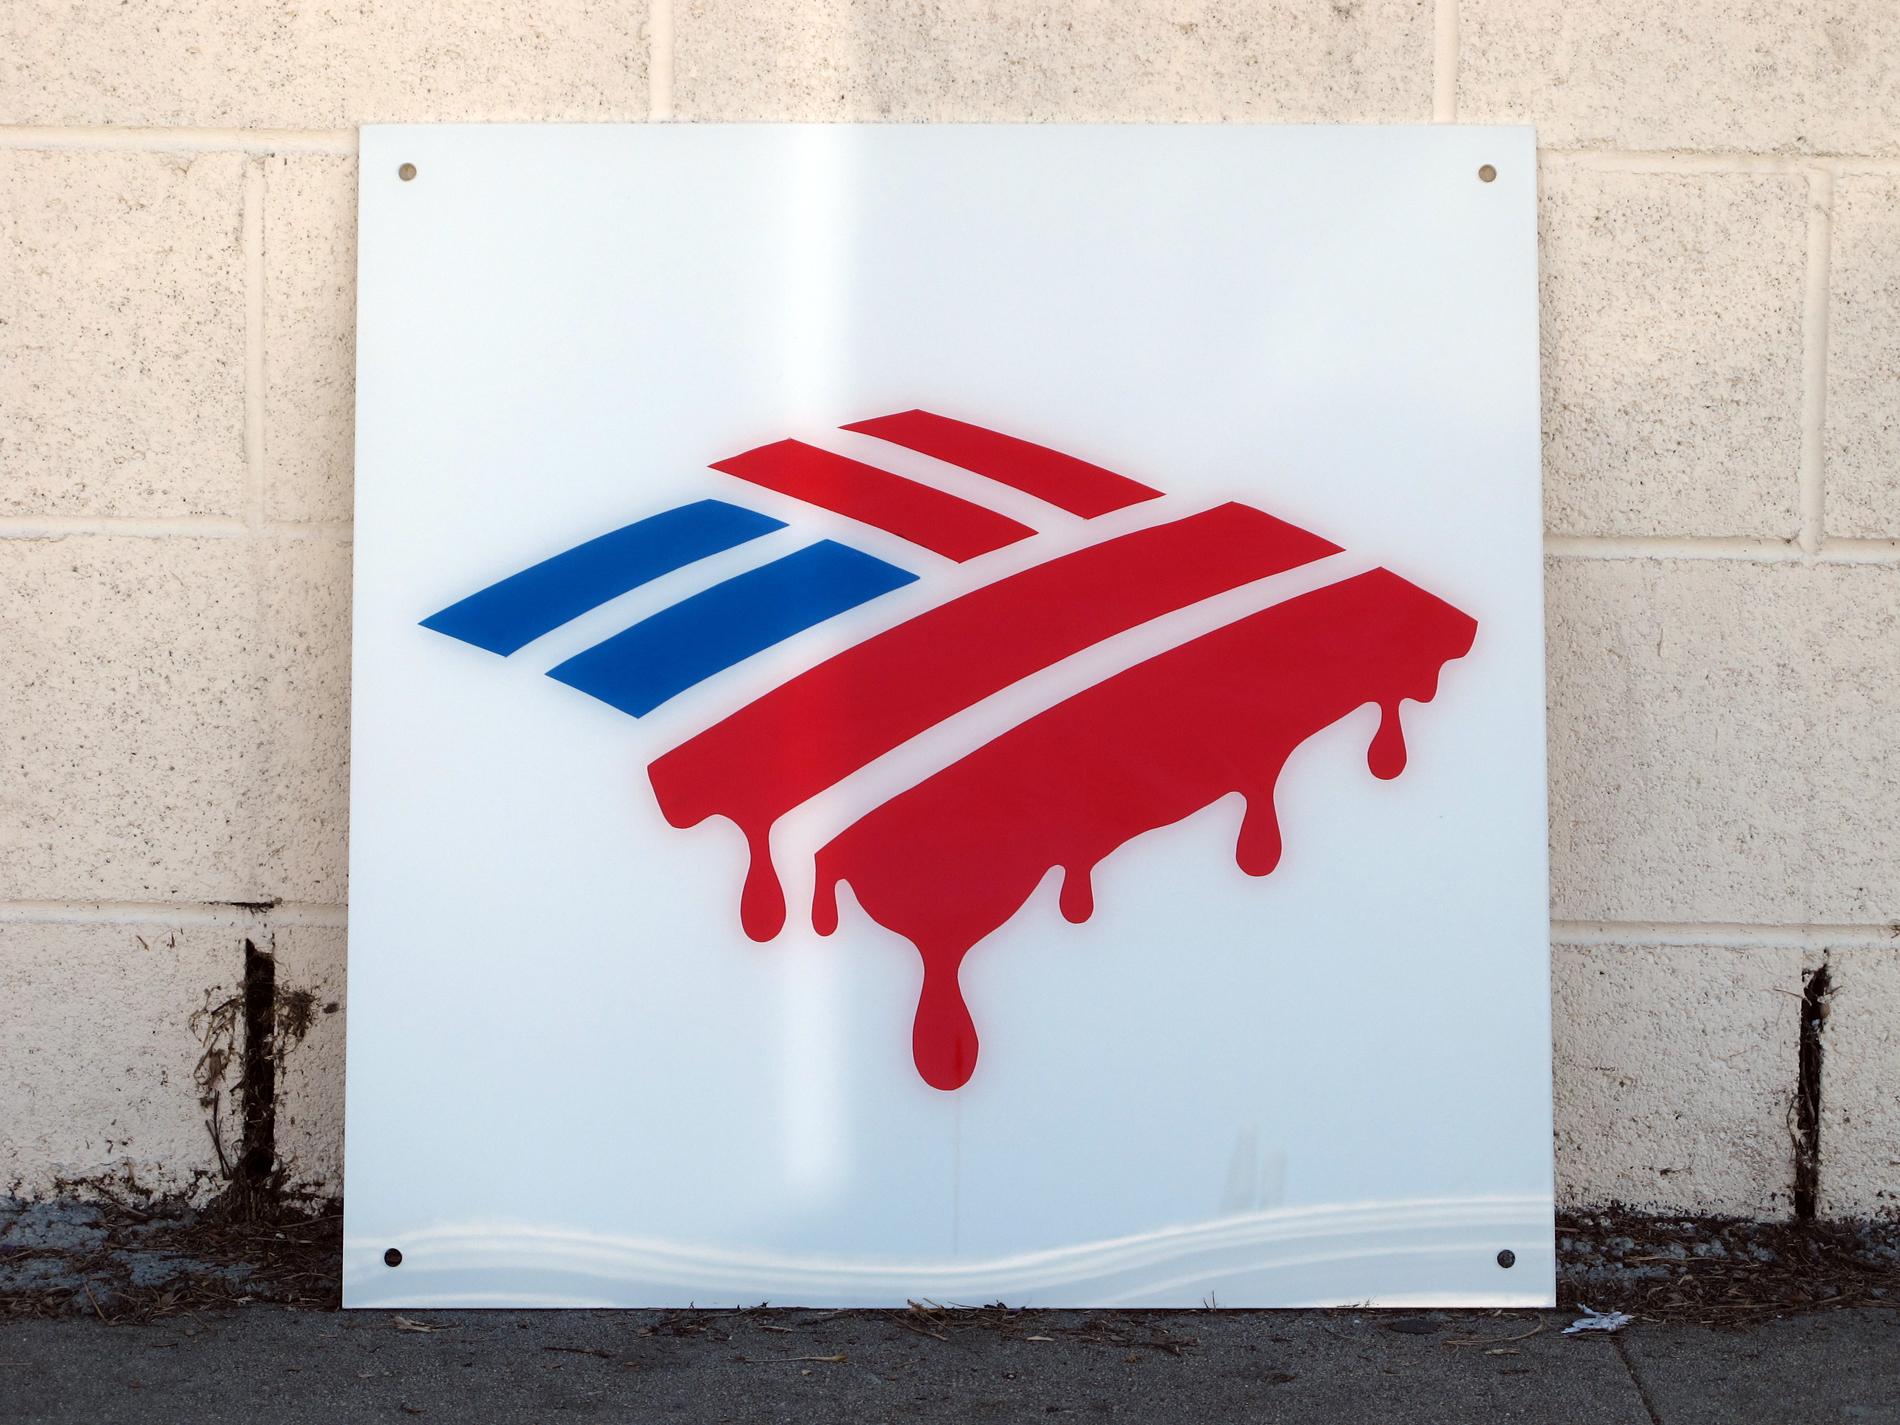 "Bank of America Bleeds America Dry (BoA B.A.D.)    2012   acrylic and enamel on UV plexiglass    24"" x 24"""